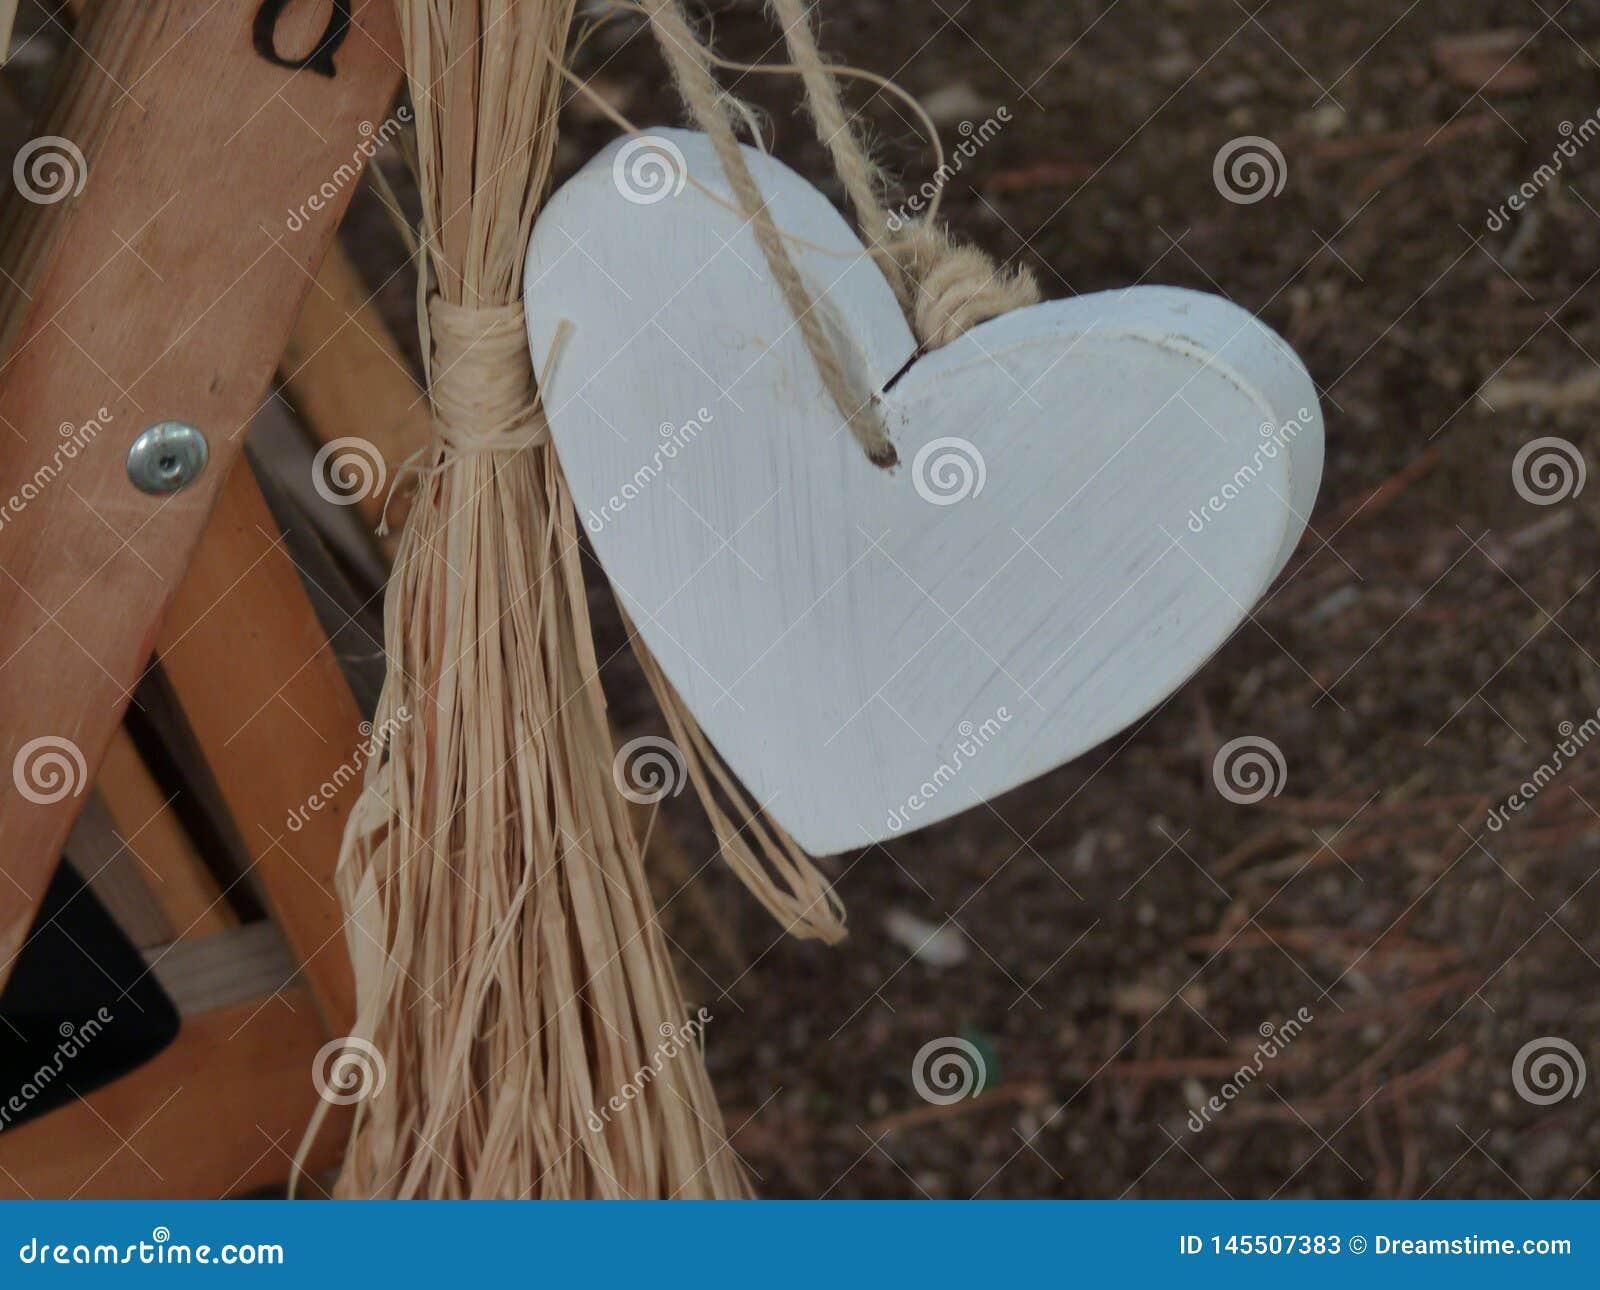 Beautiful white wooden heart